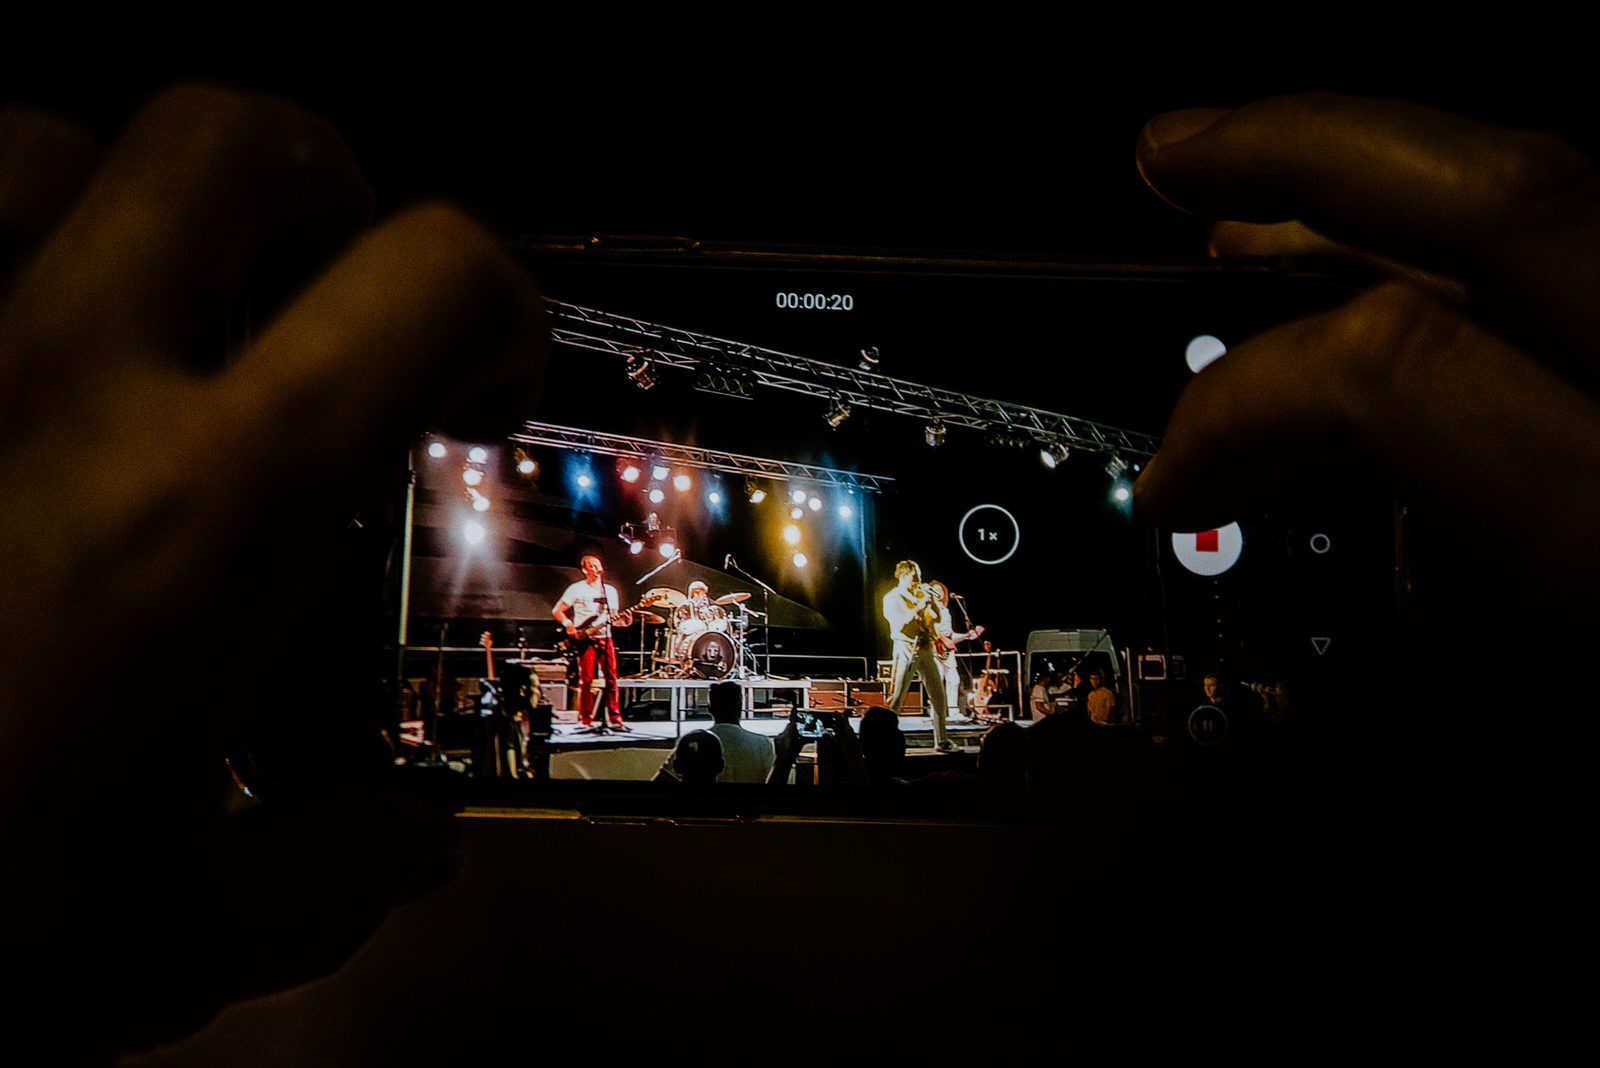 likaclub_novalja_queen-real-tribute-band_2019-10